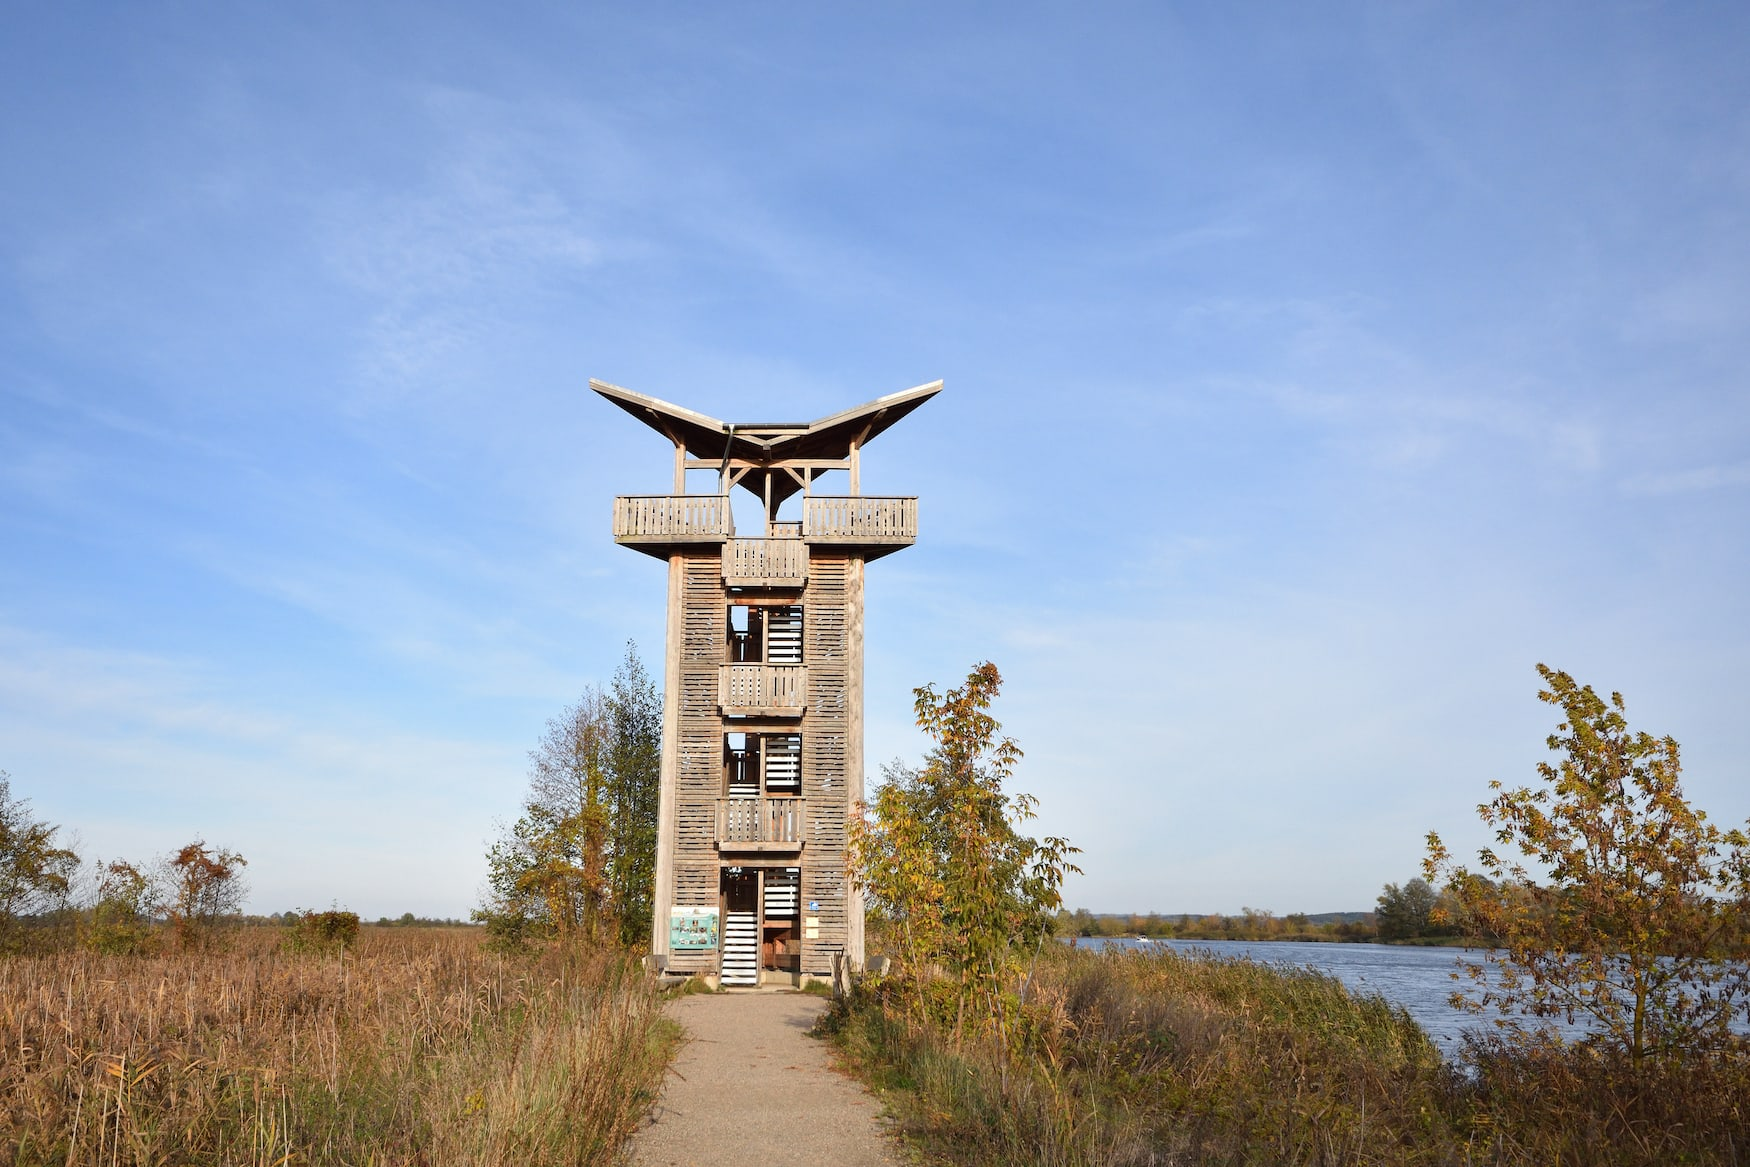 Nationalpark Unteres Odertal in Mescherin